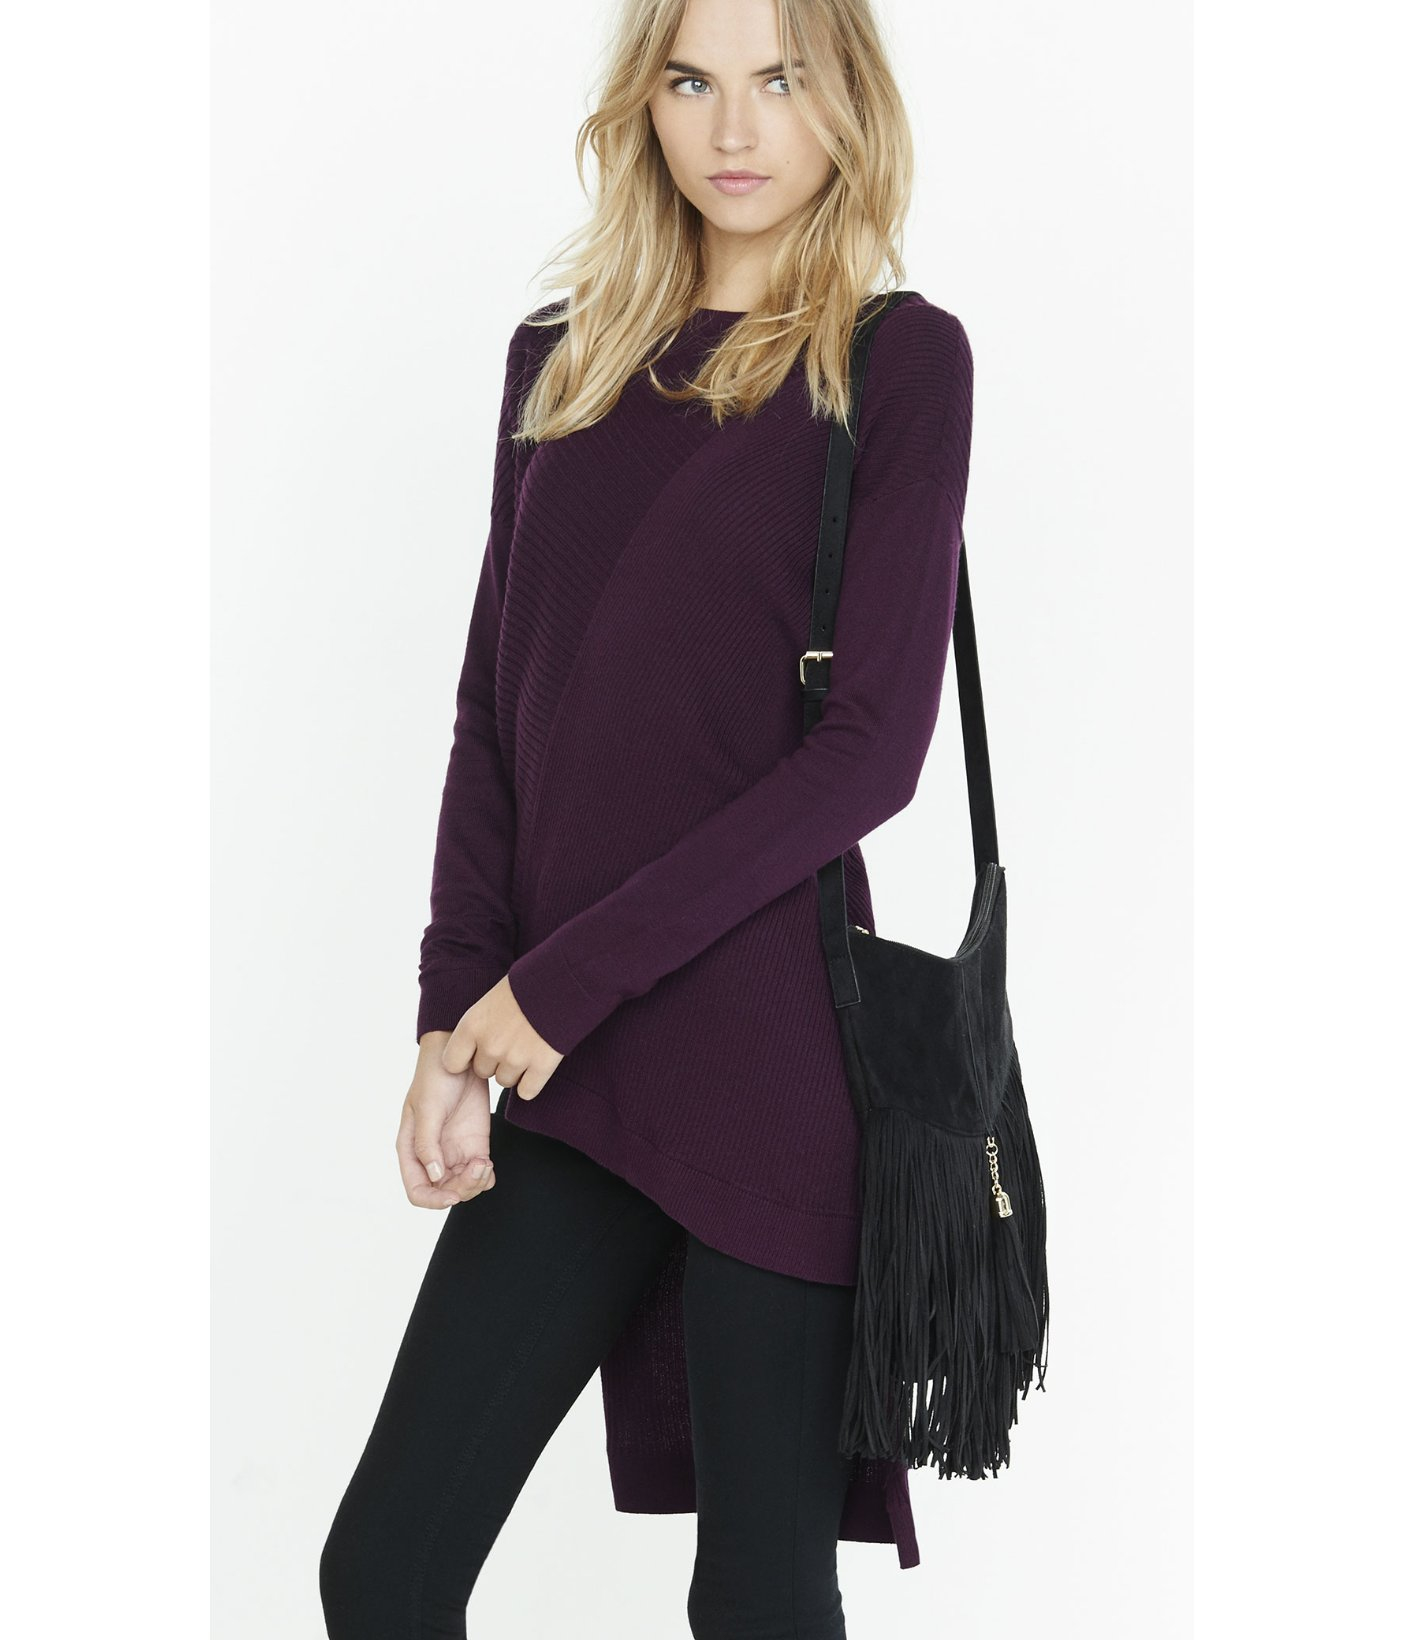 Express Ribbed Asymmetrical Hi-lo Hem Tunic Sweater in Purple | Lyst